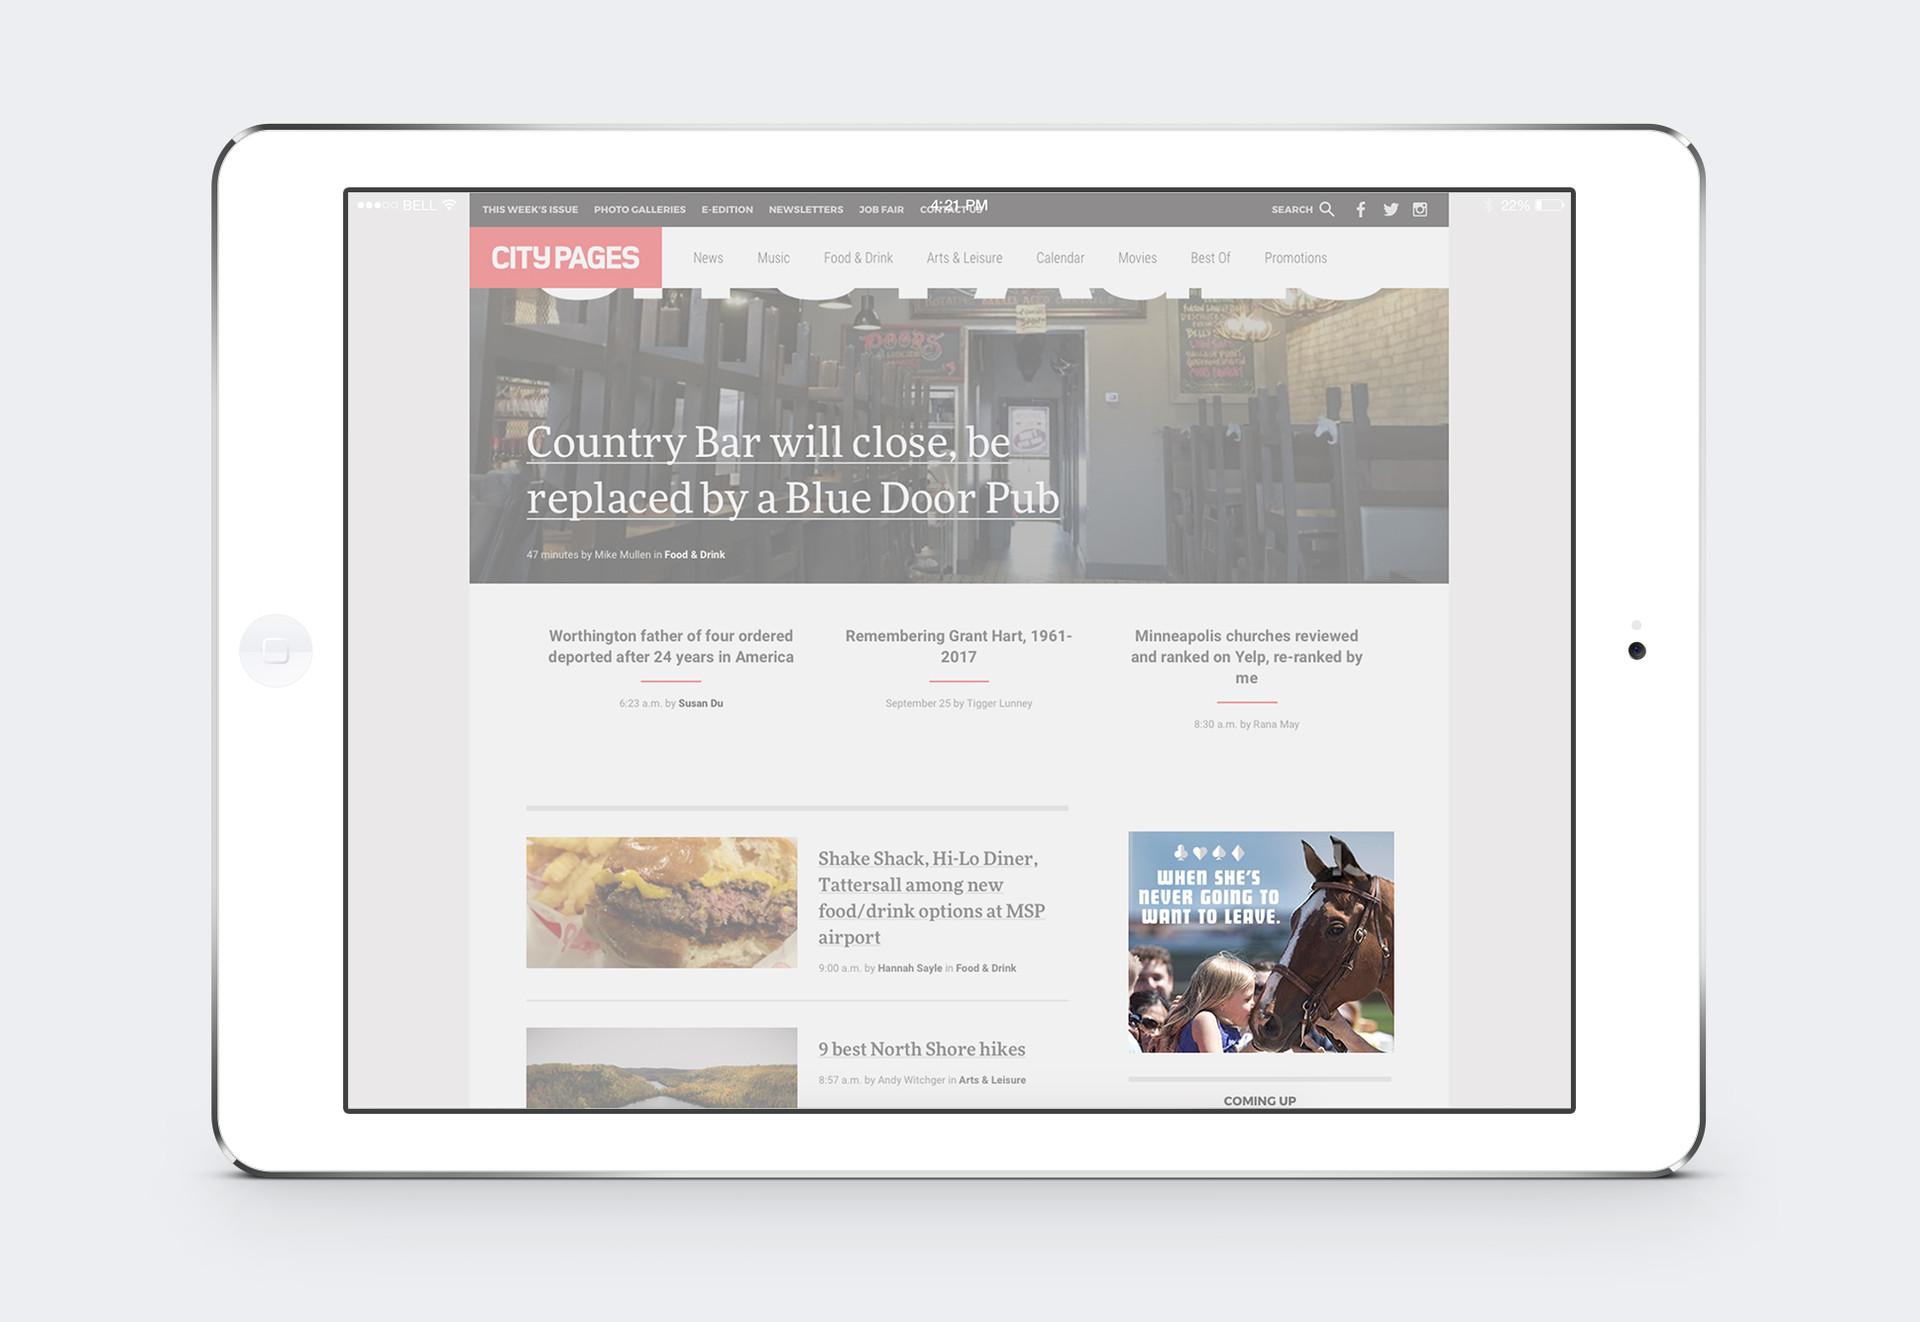 02-iPad-Air-Landscape-Mock-up_girl.jpg